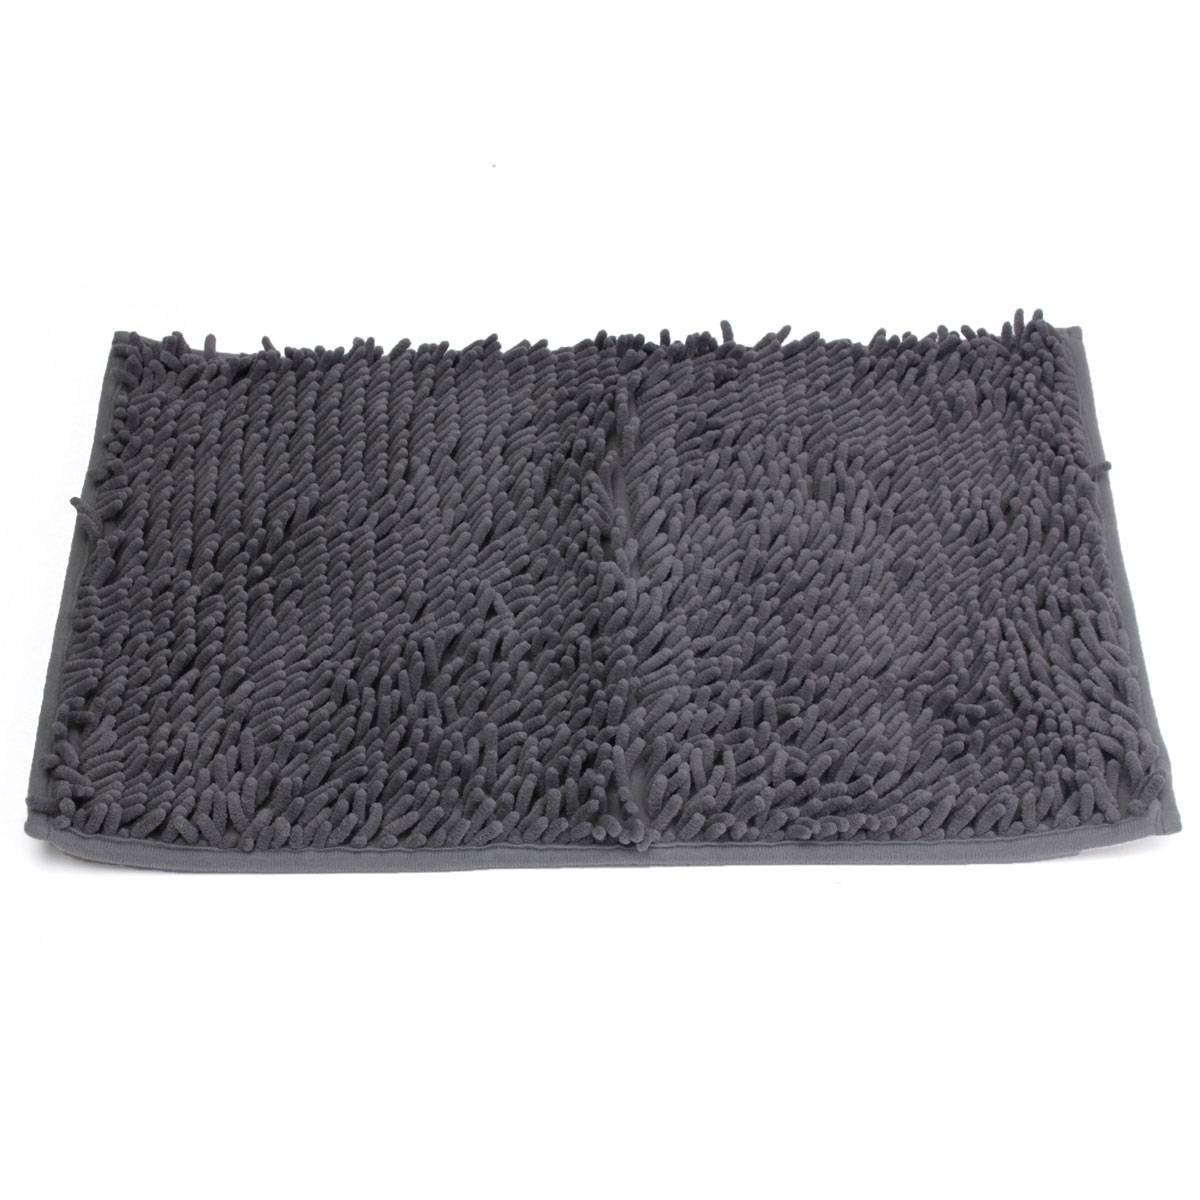 1pcs washable bathroom new shaggy rugs non slip bath mat thick 40x60cm dark gray